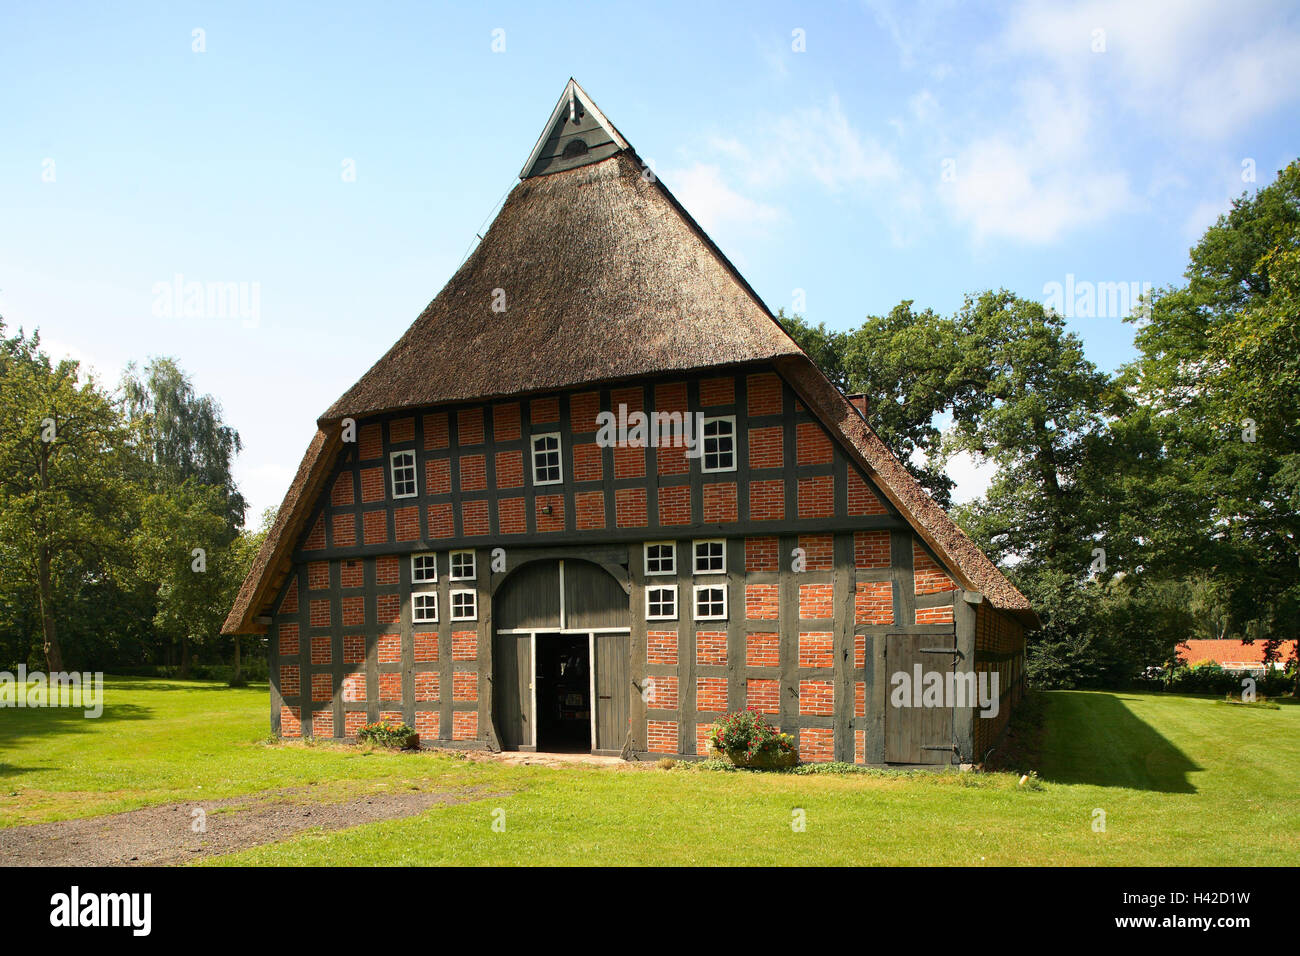 Resthof Kaufen Norddeutschland | Lali Shervashidze